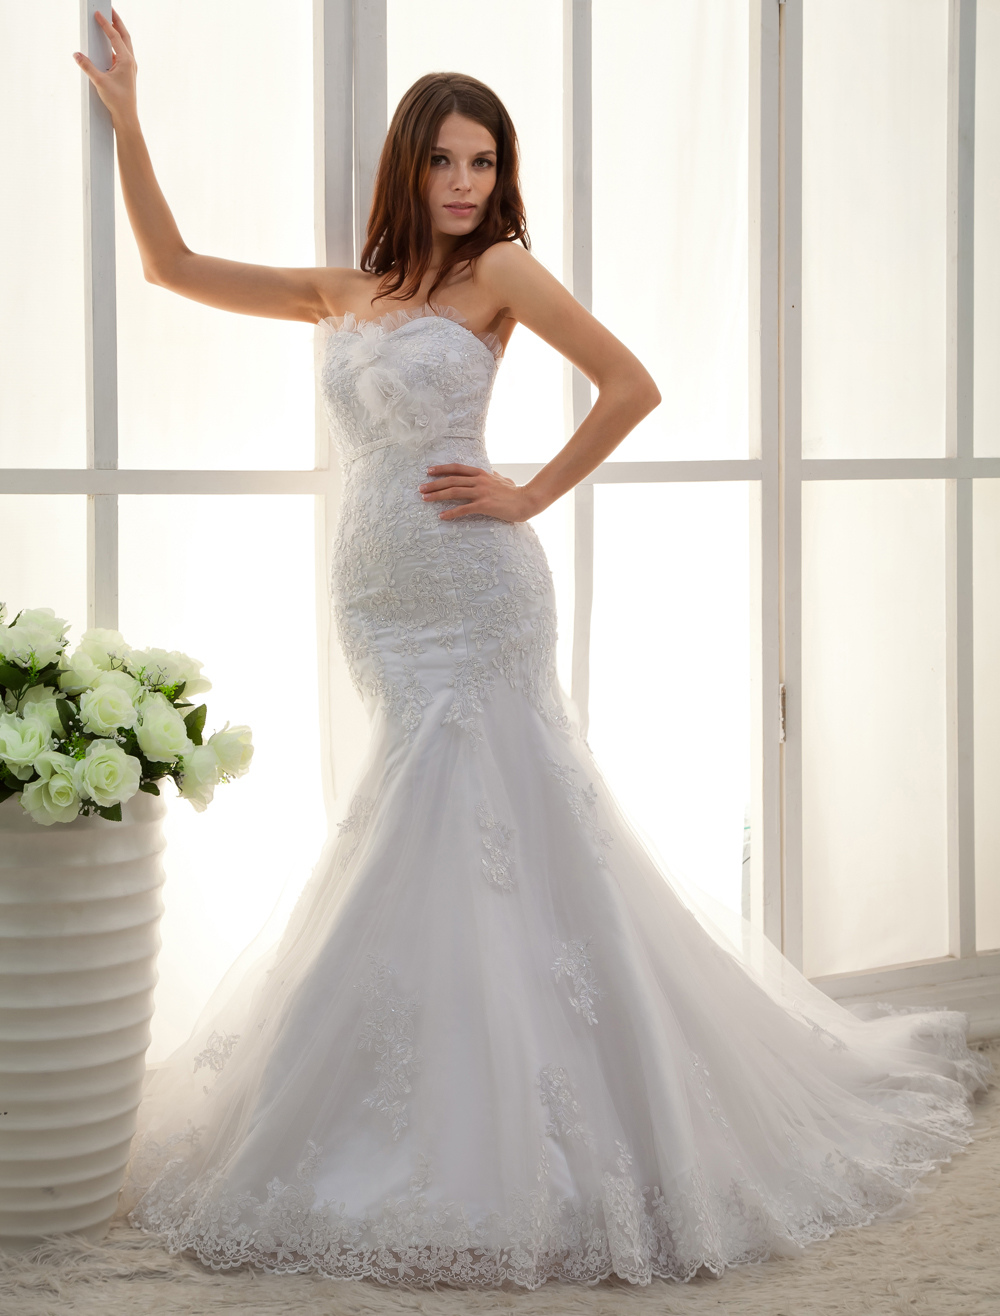 White Sweetheart Applique Lace Mermaid Trumpet Wedding Dress